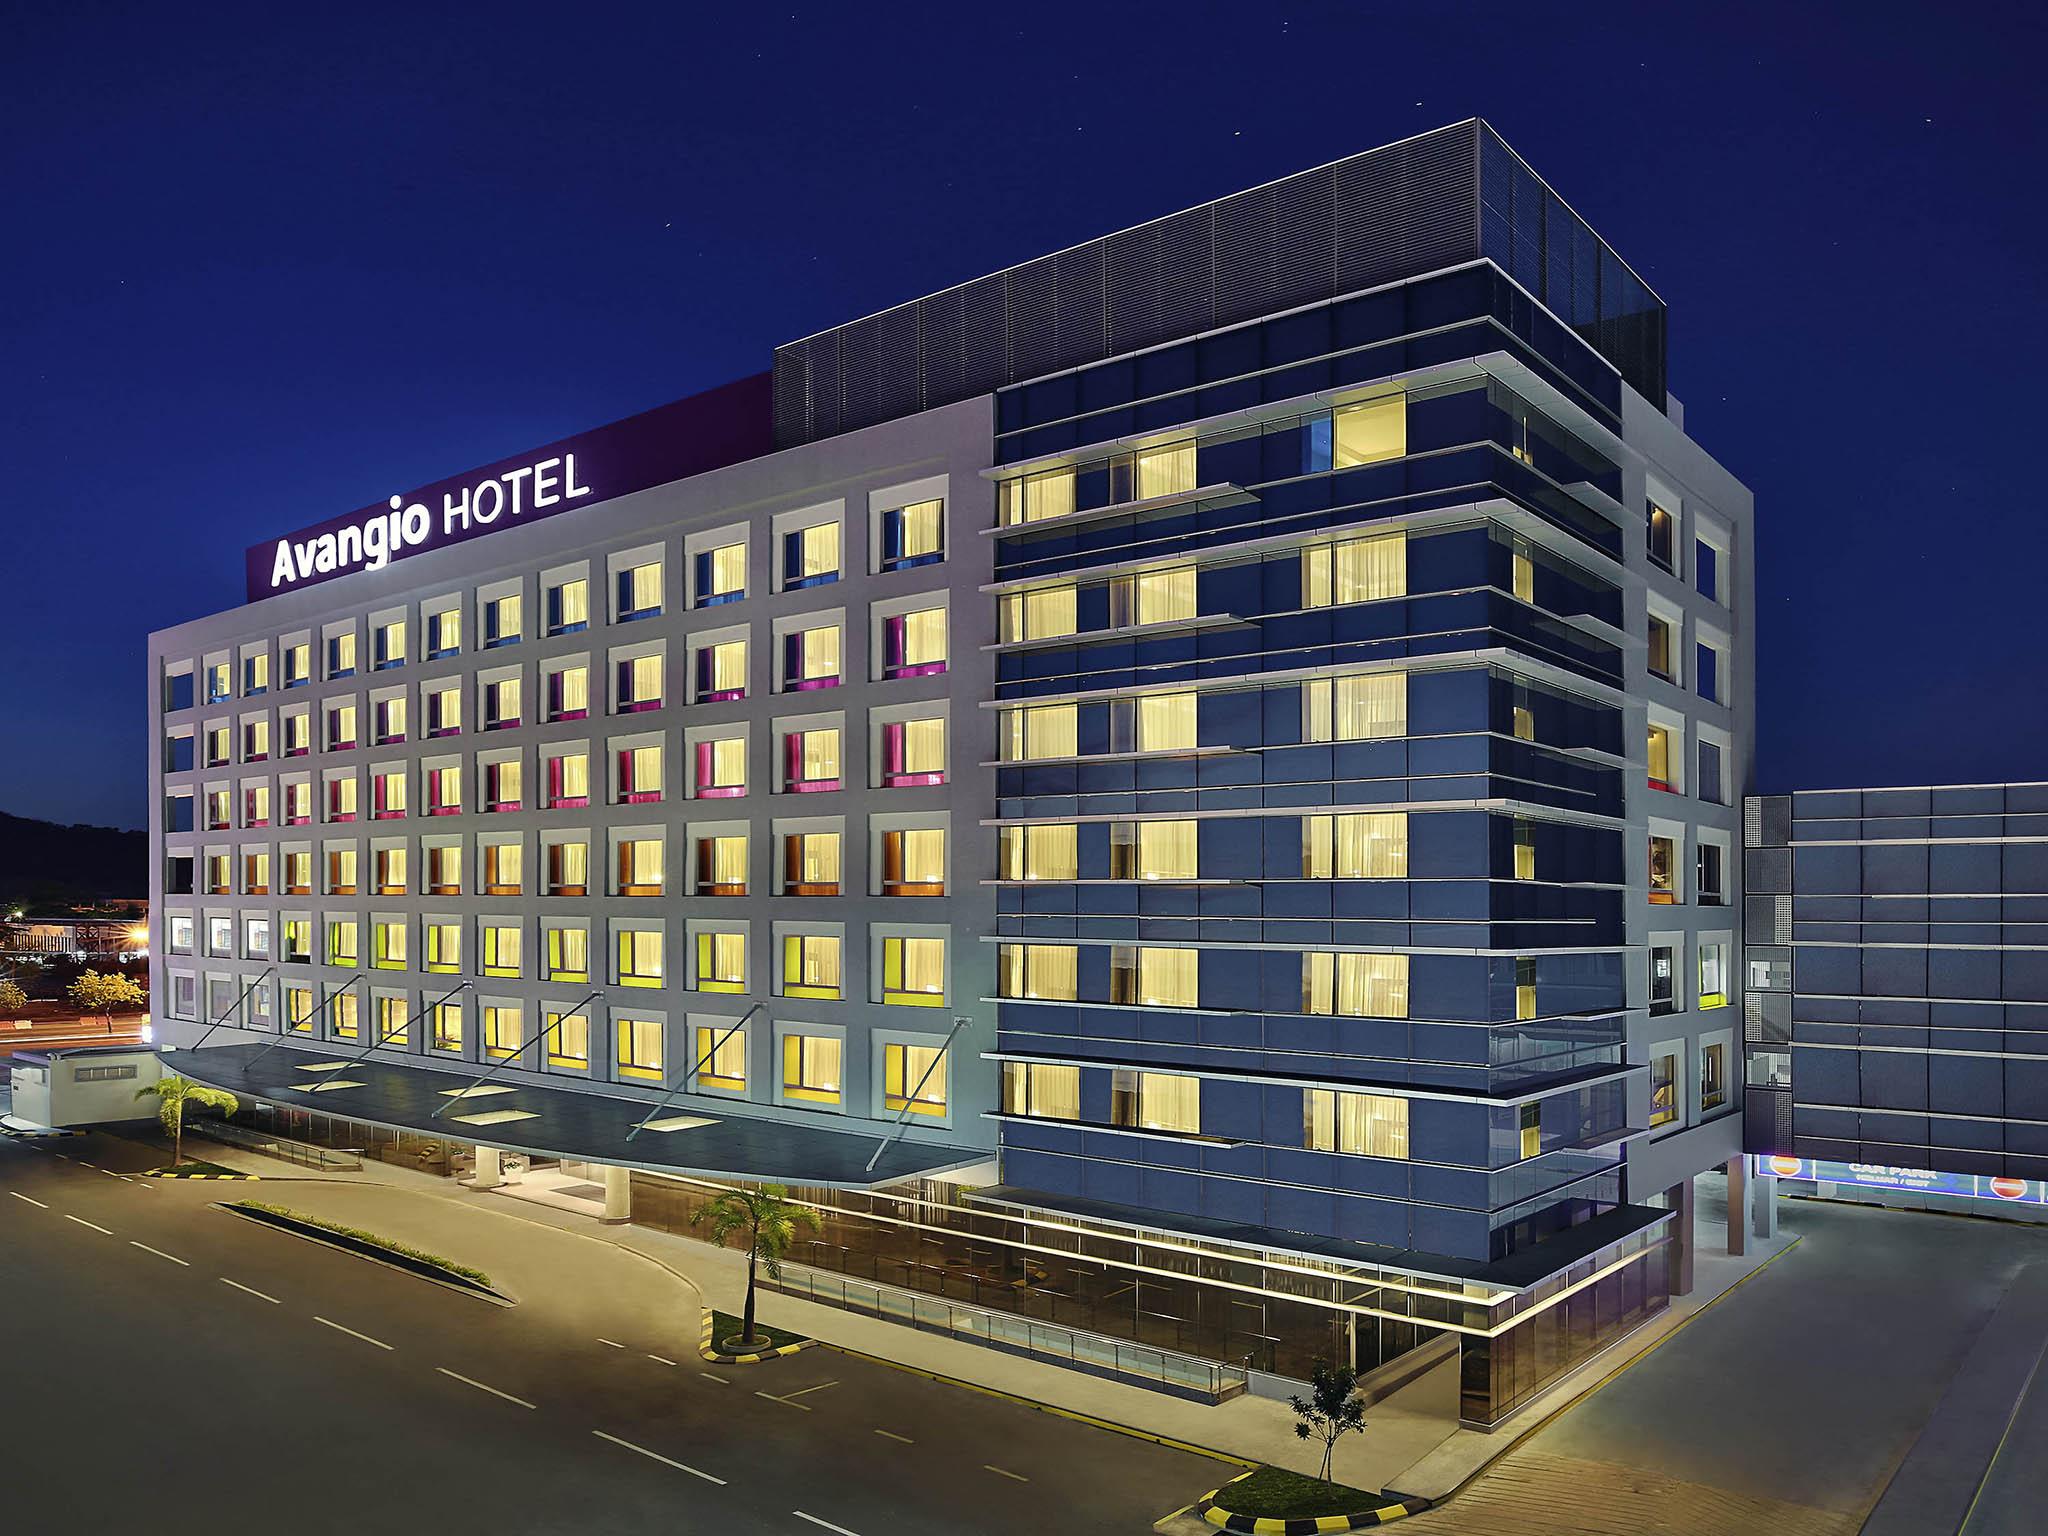 Hôtel - Avangio Hotel Kota Kinabalu - Géré par AccorHotels